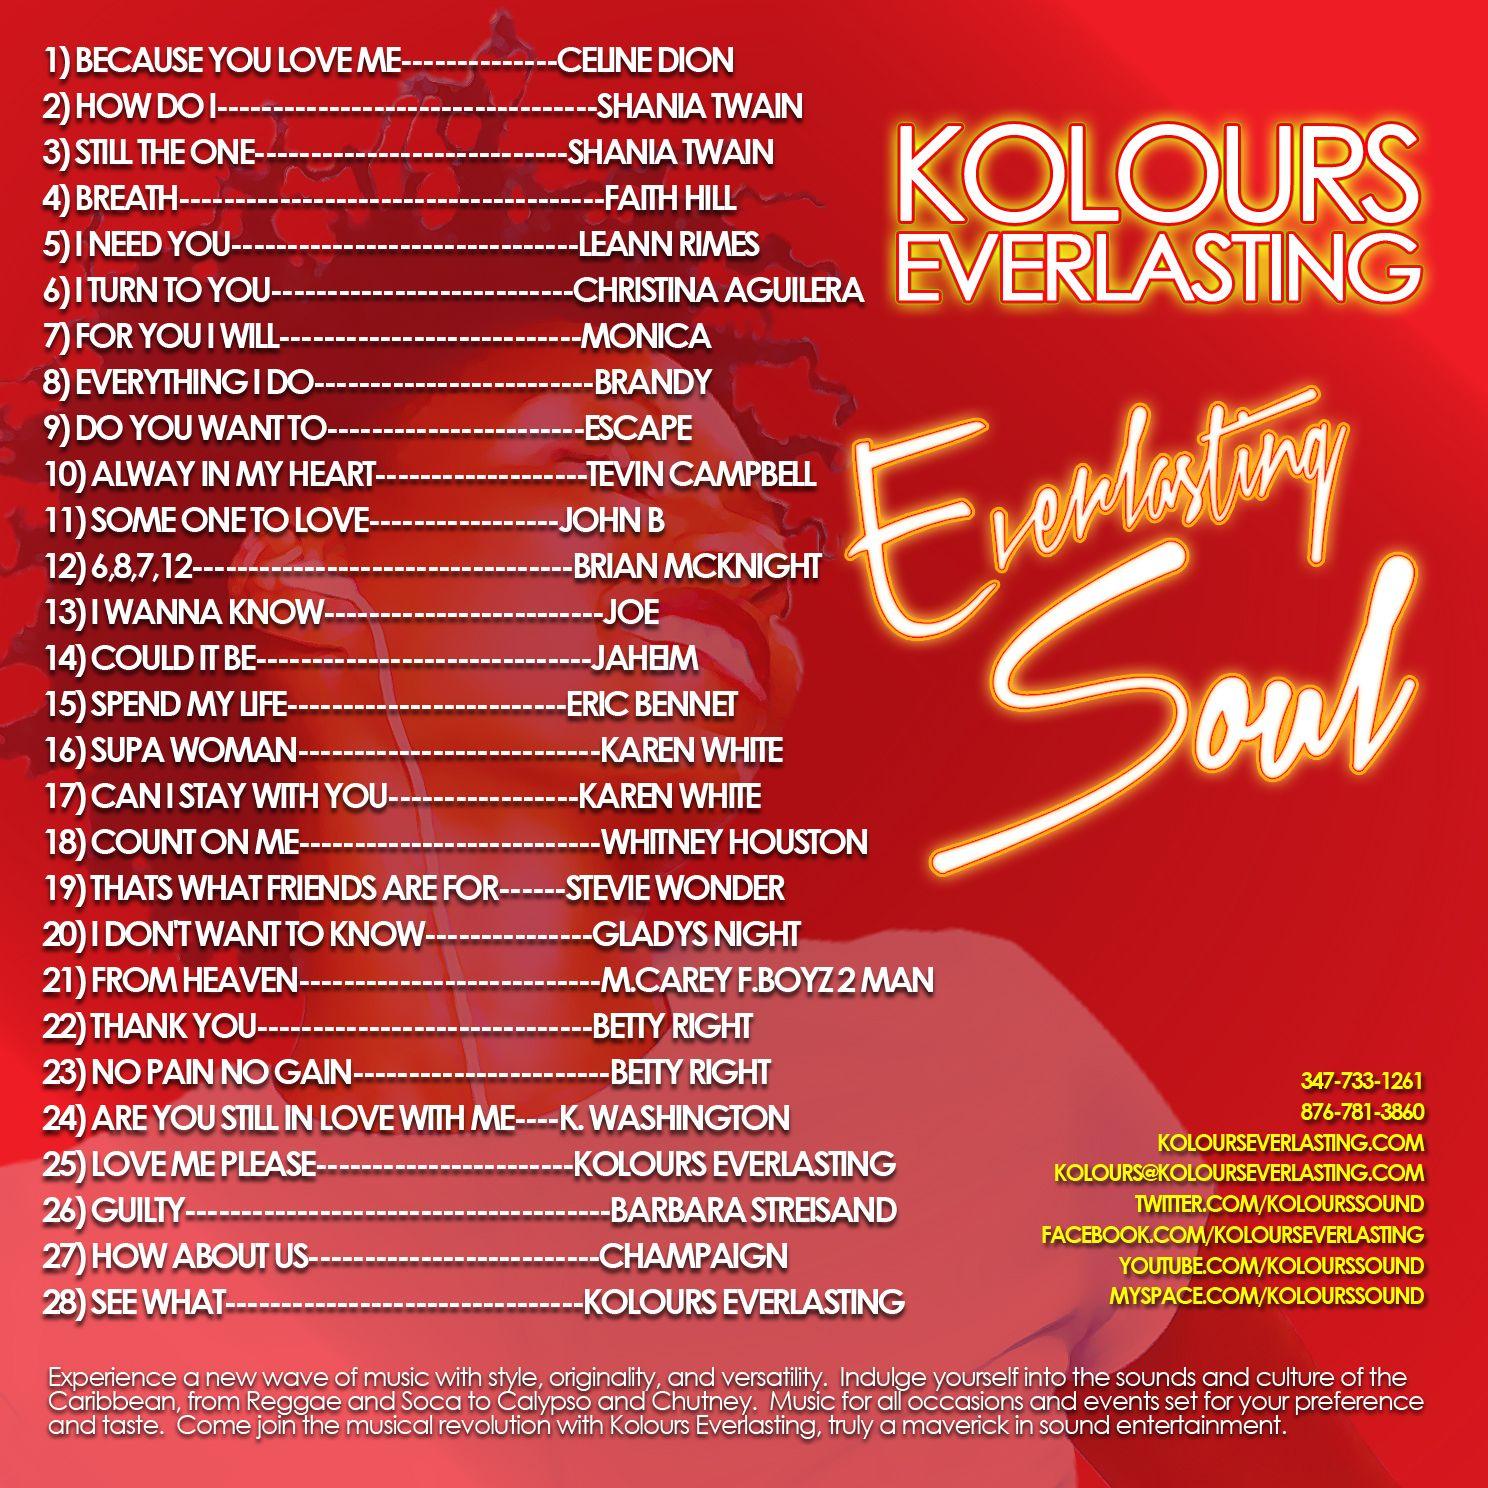 Kolours Everlasting Souls Slow Jam Country Old Hits Mixtape Brian Mcknight Faith Hill